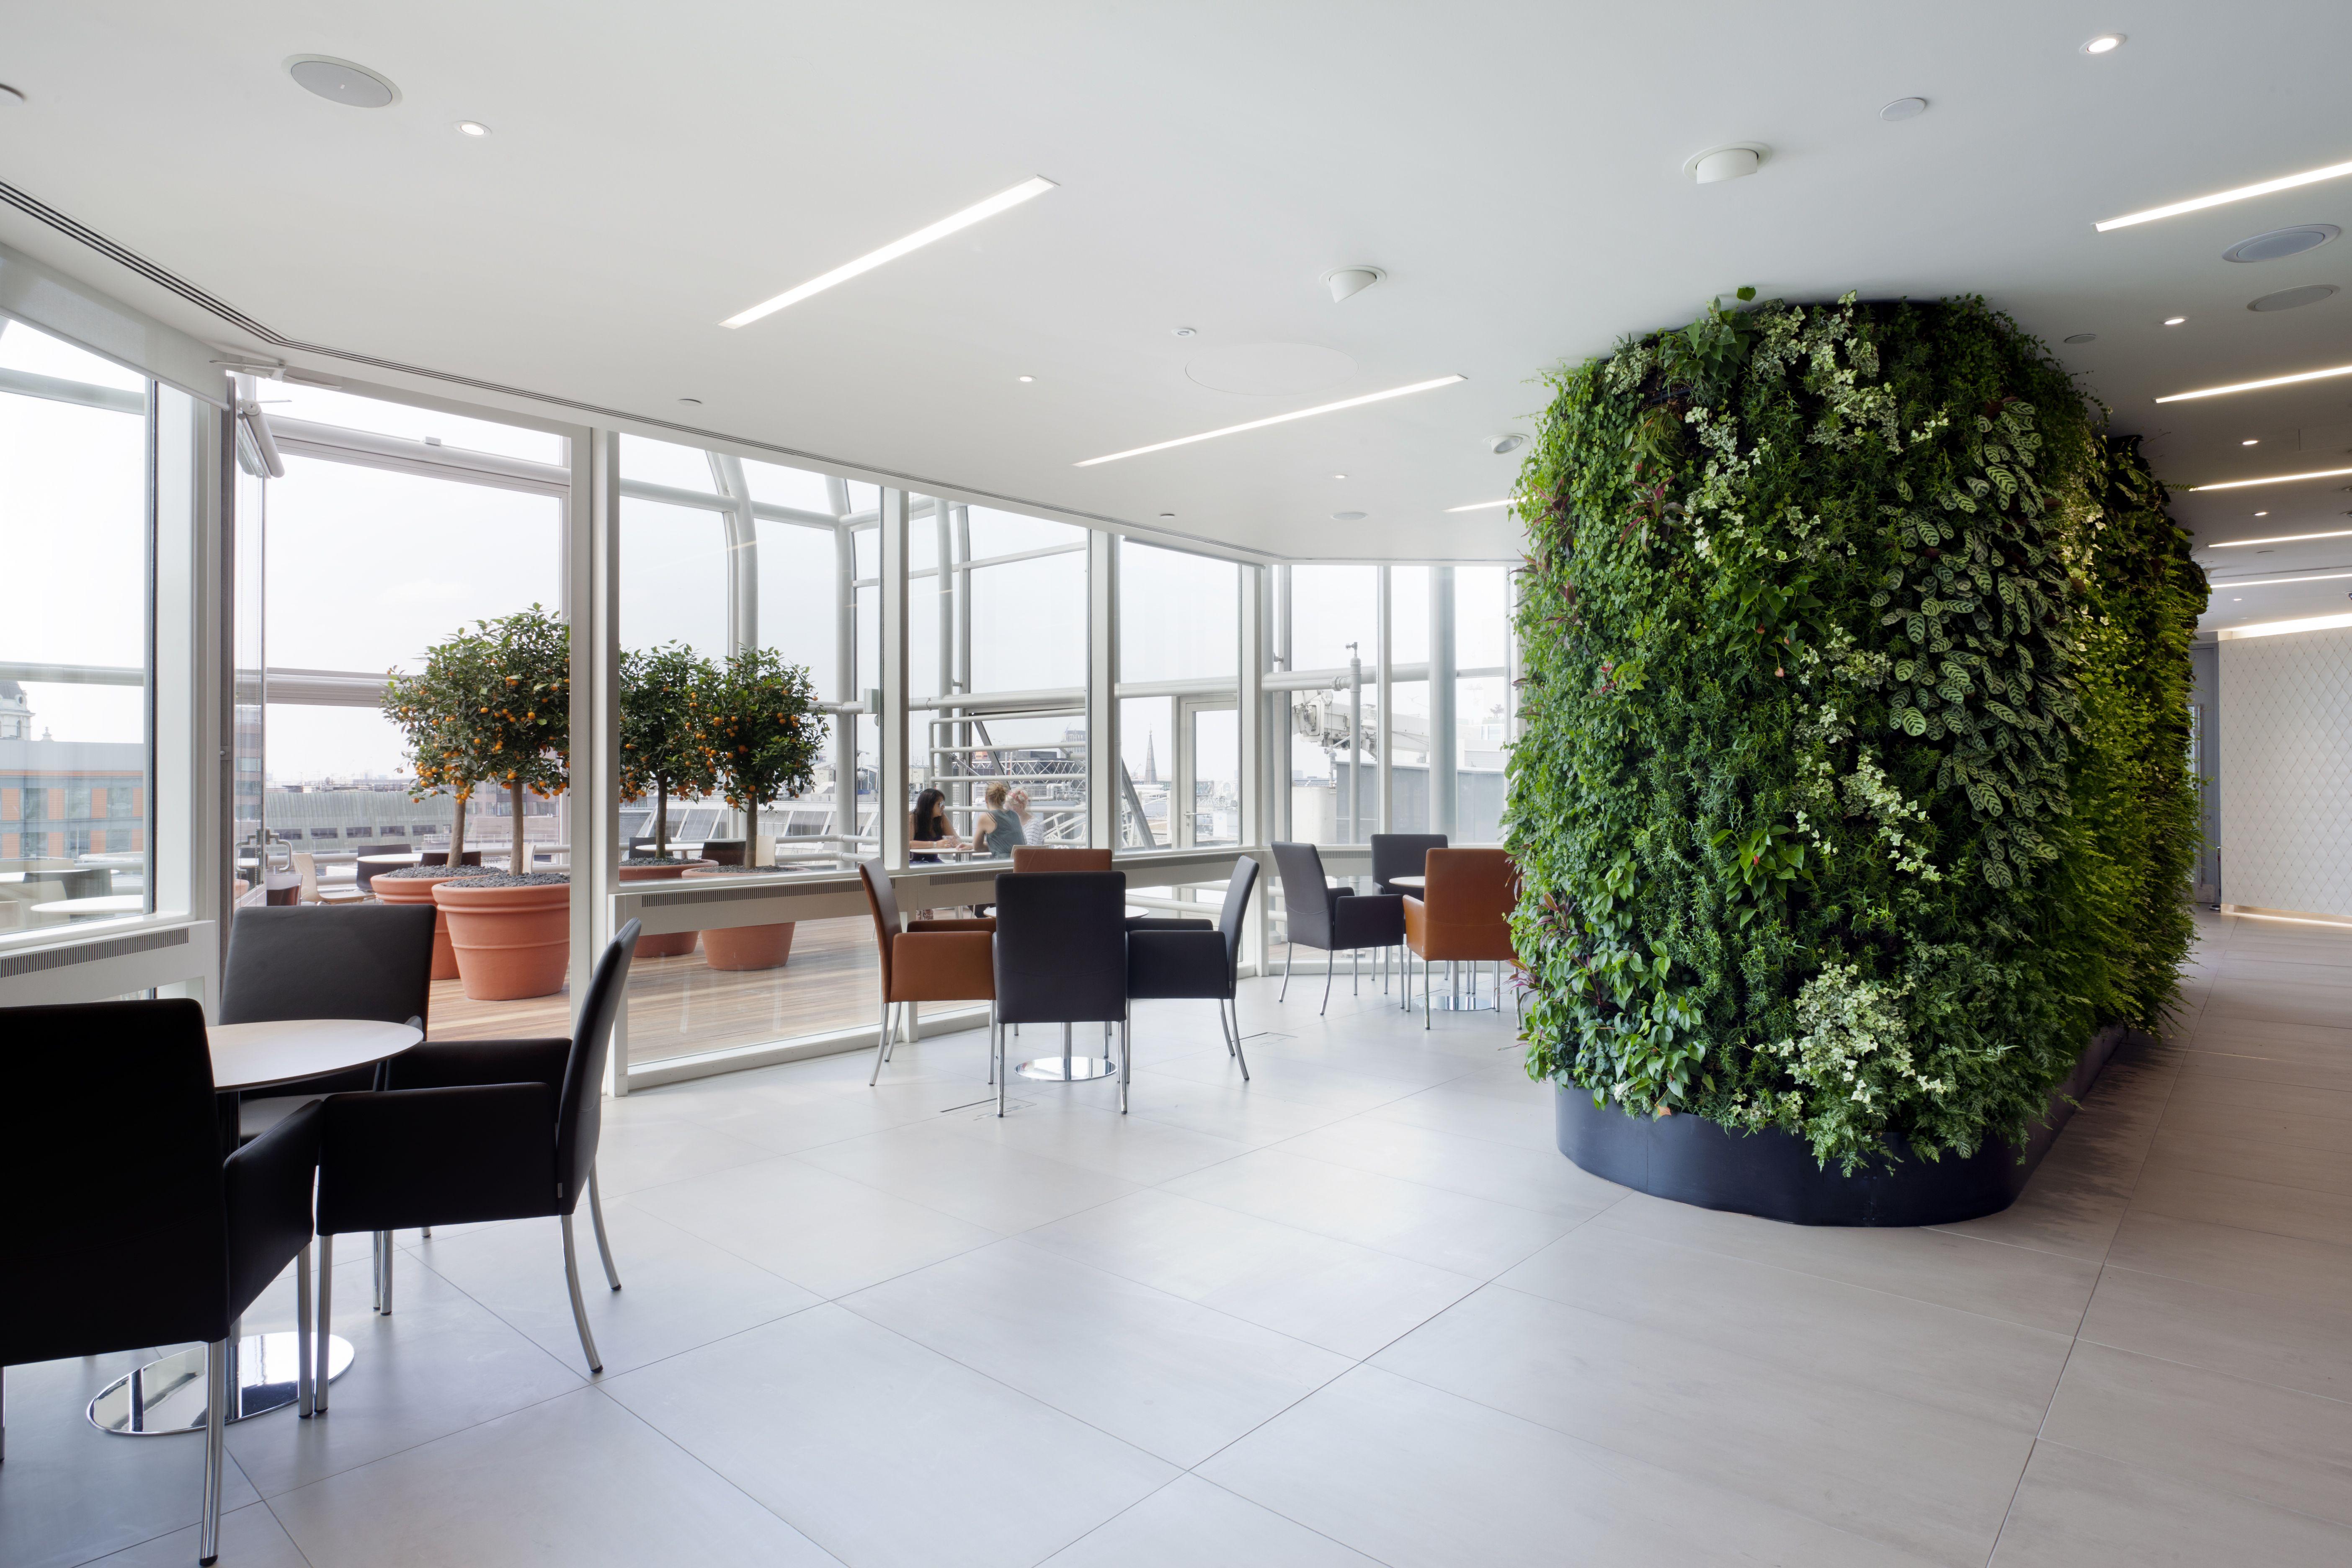 Office design by Artillery Interior Architecture, Melbourne.